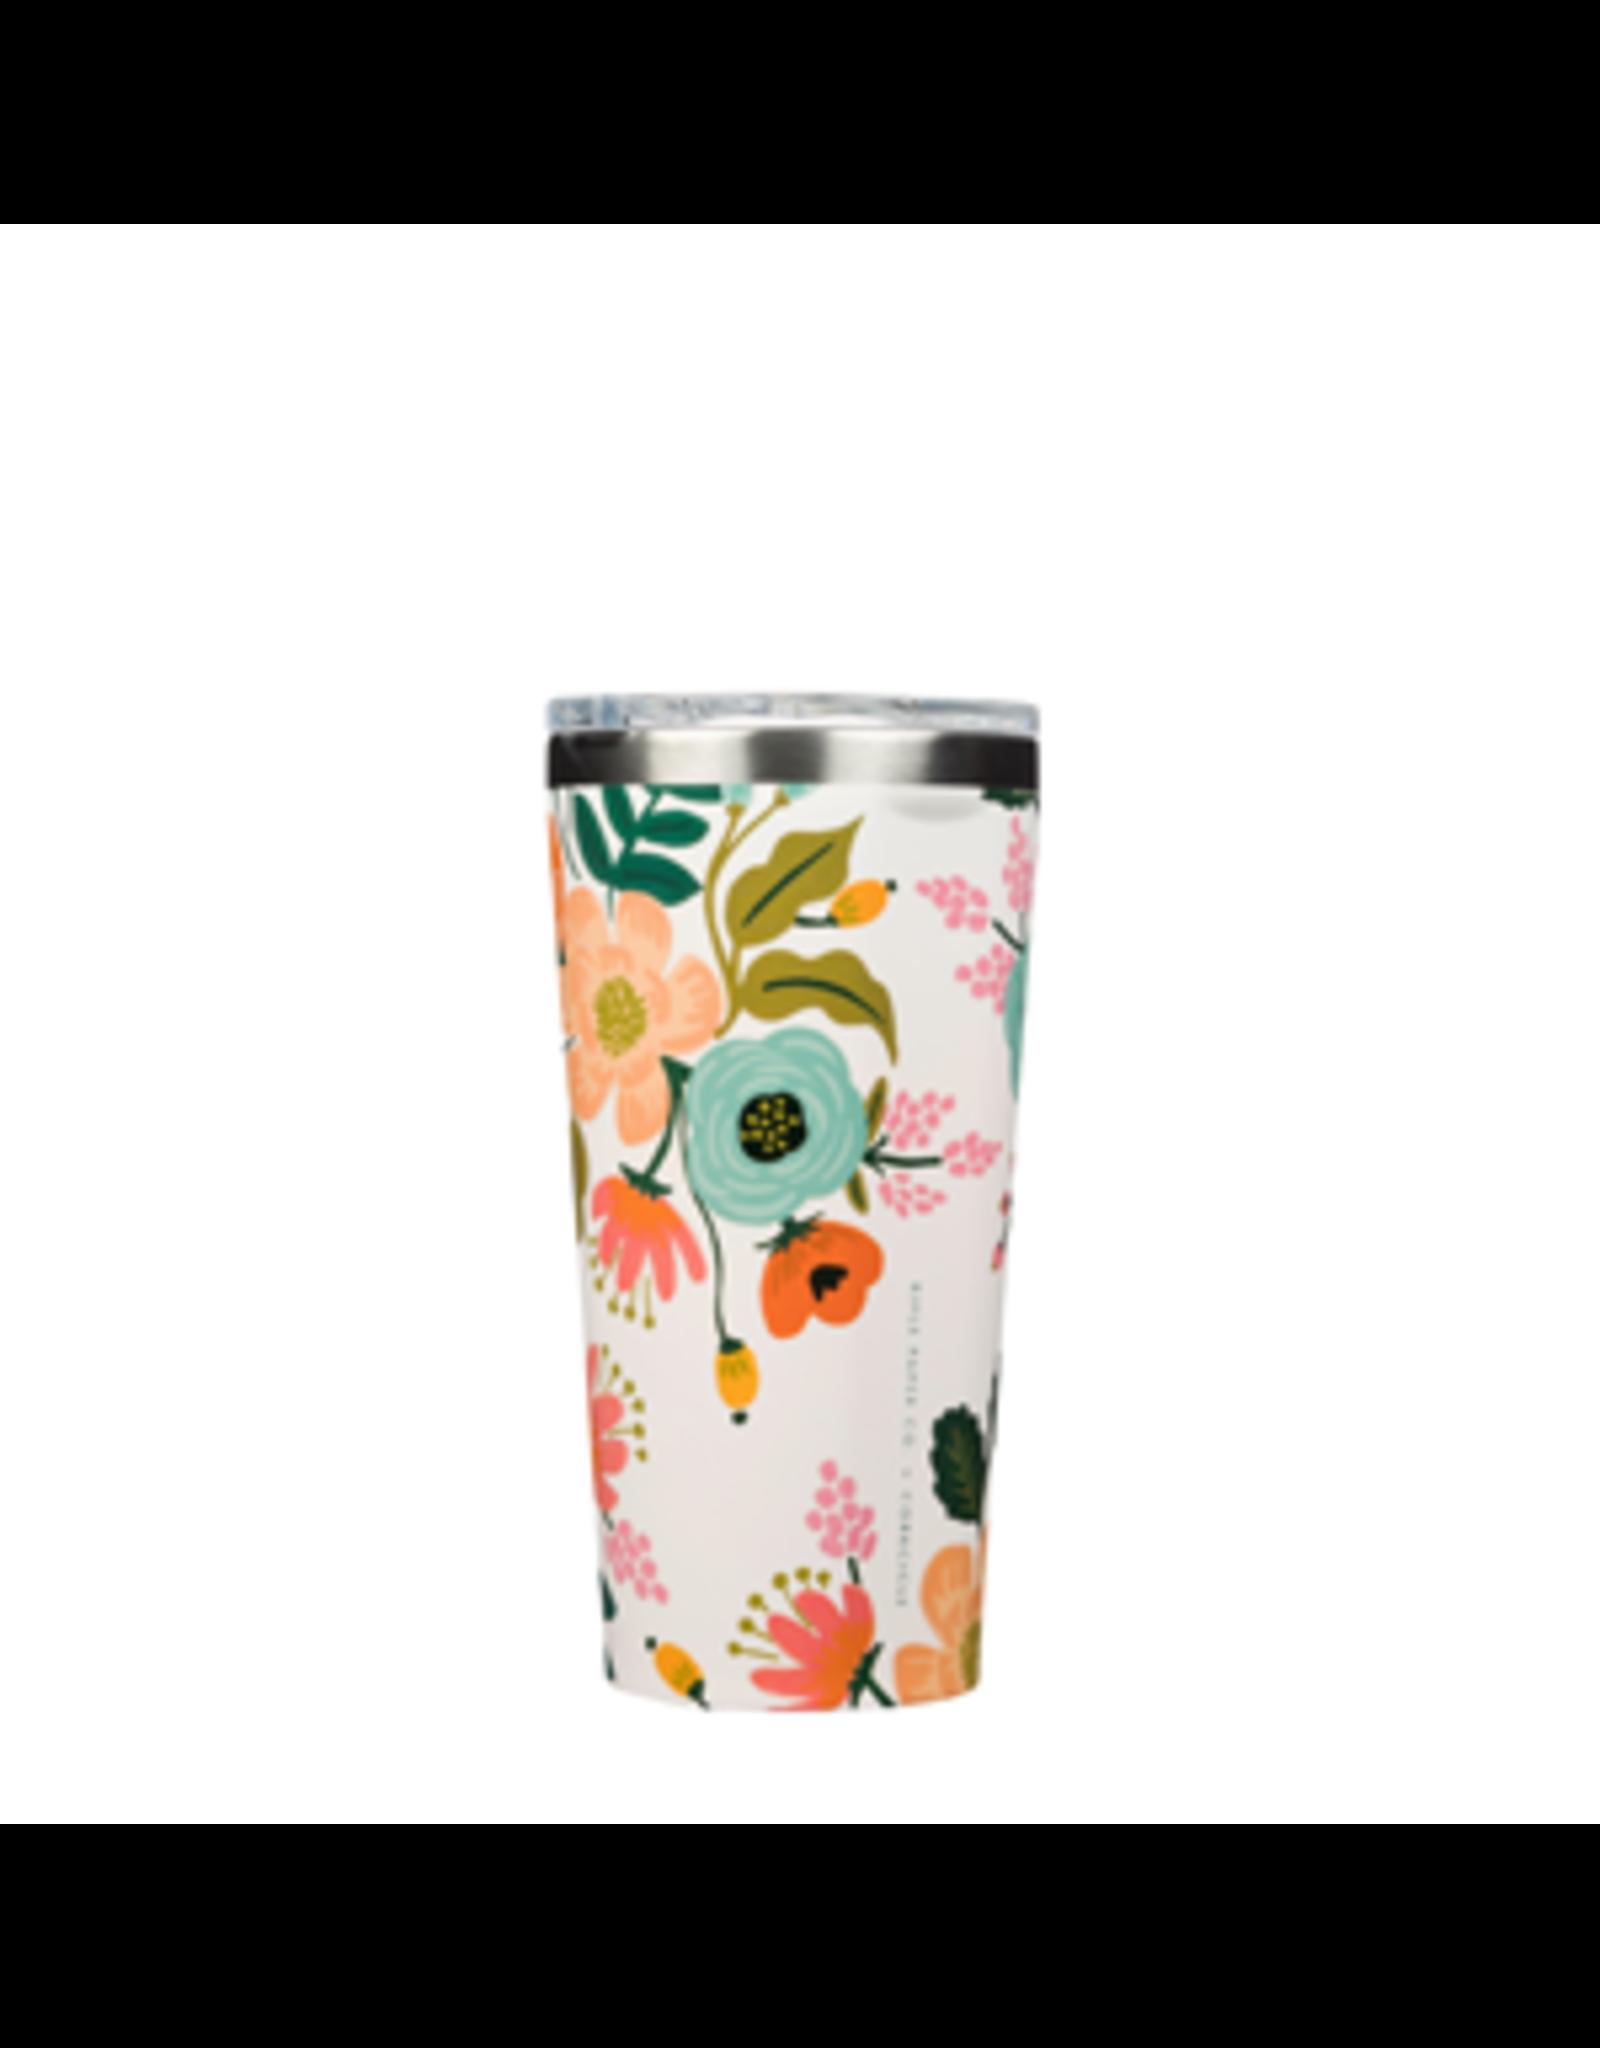 Corkcicle Tumbler, Lively Floral Cream, 16 oz.